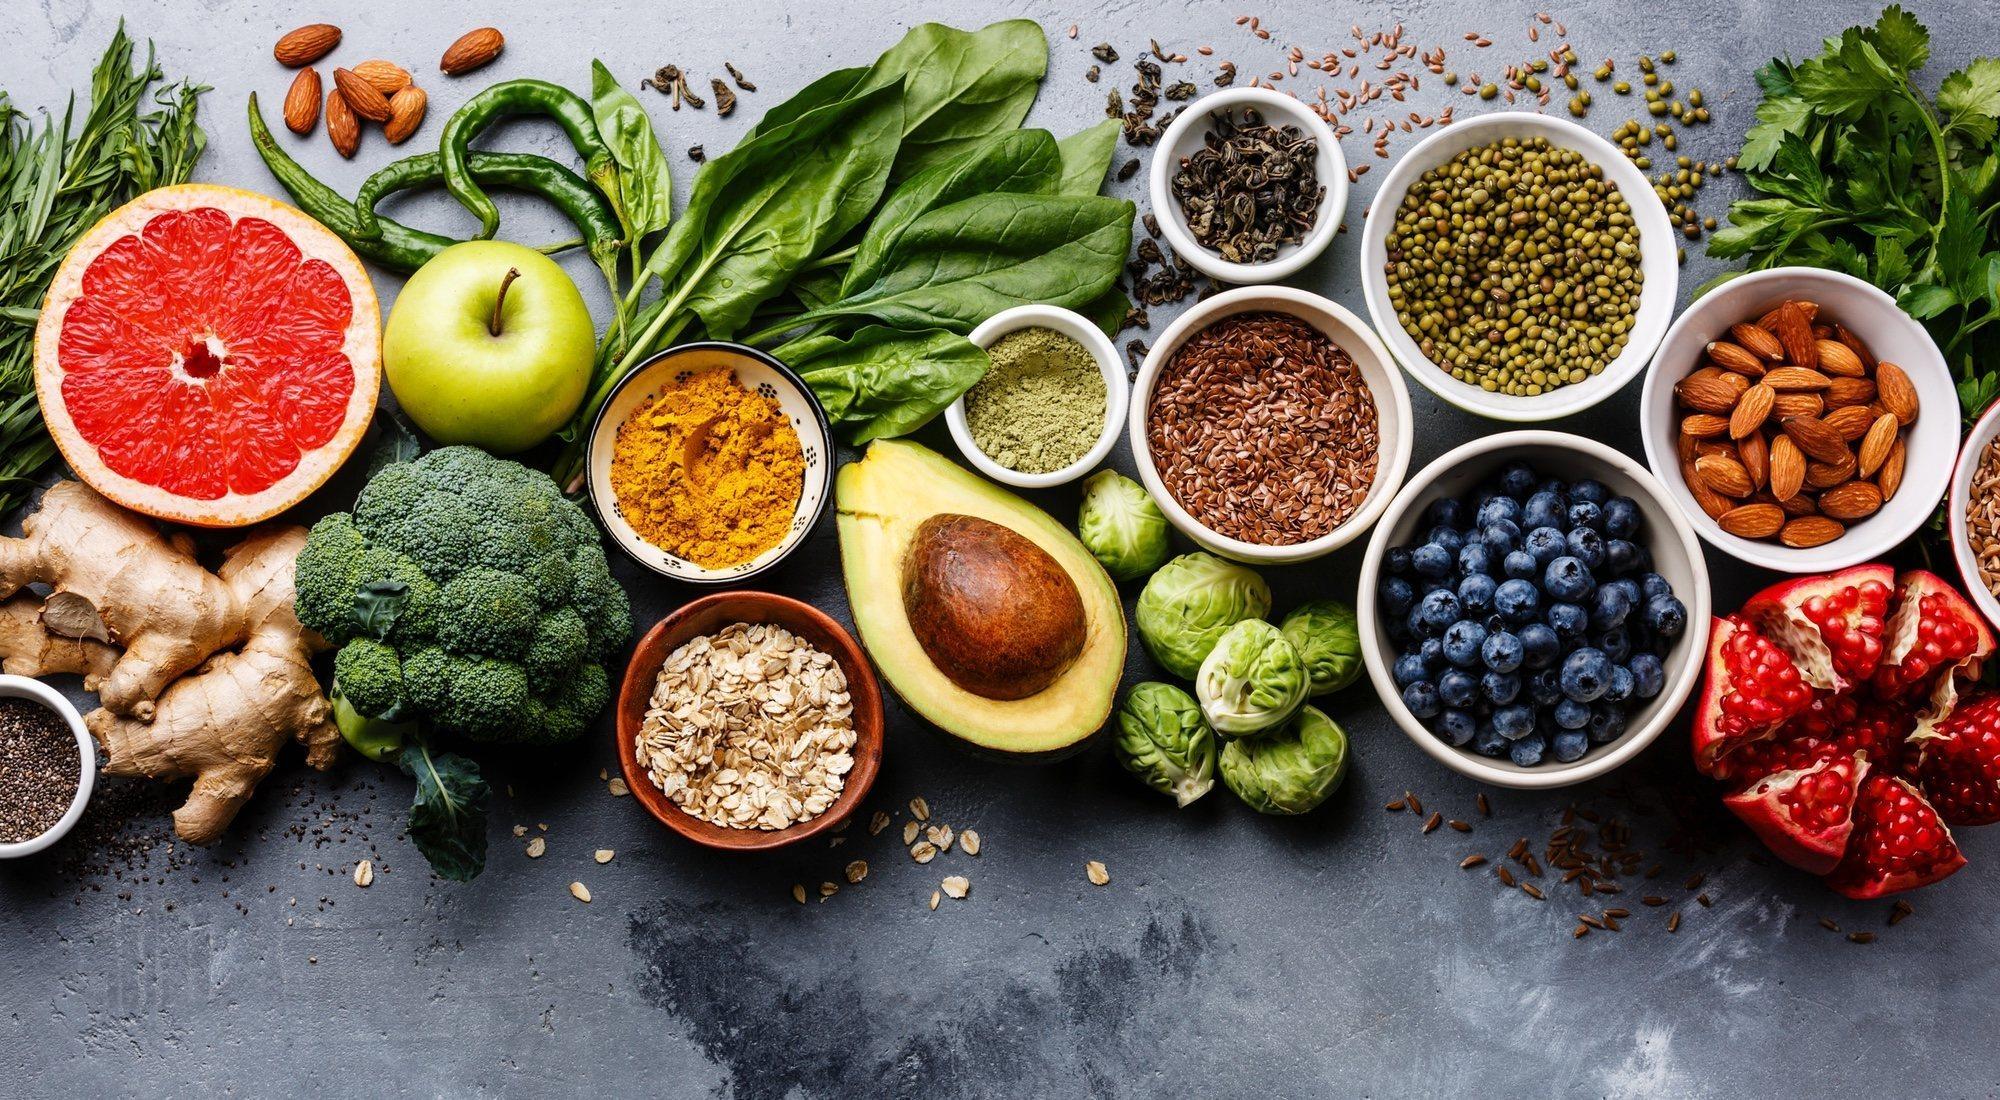 ganar-masa-muscular-alimentos-indispensables-en-tu-dieta